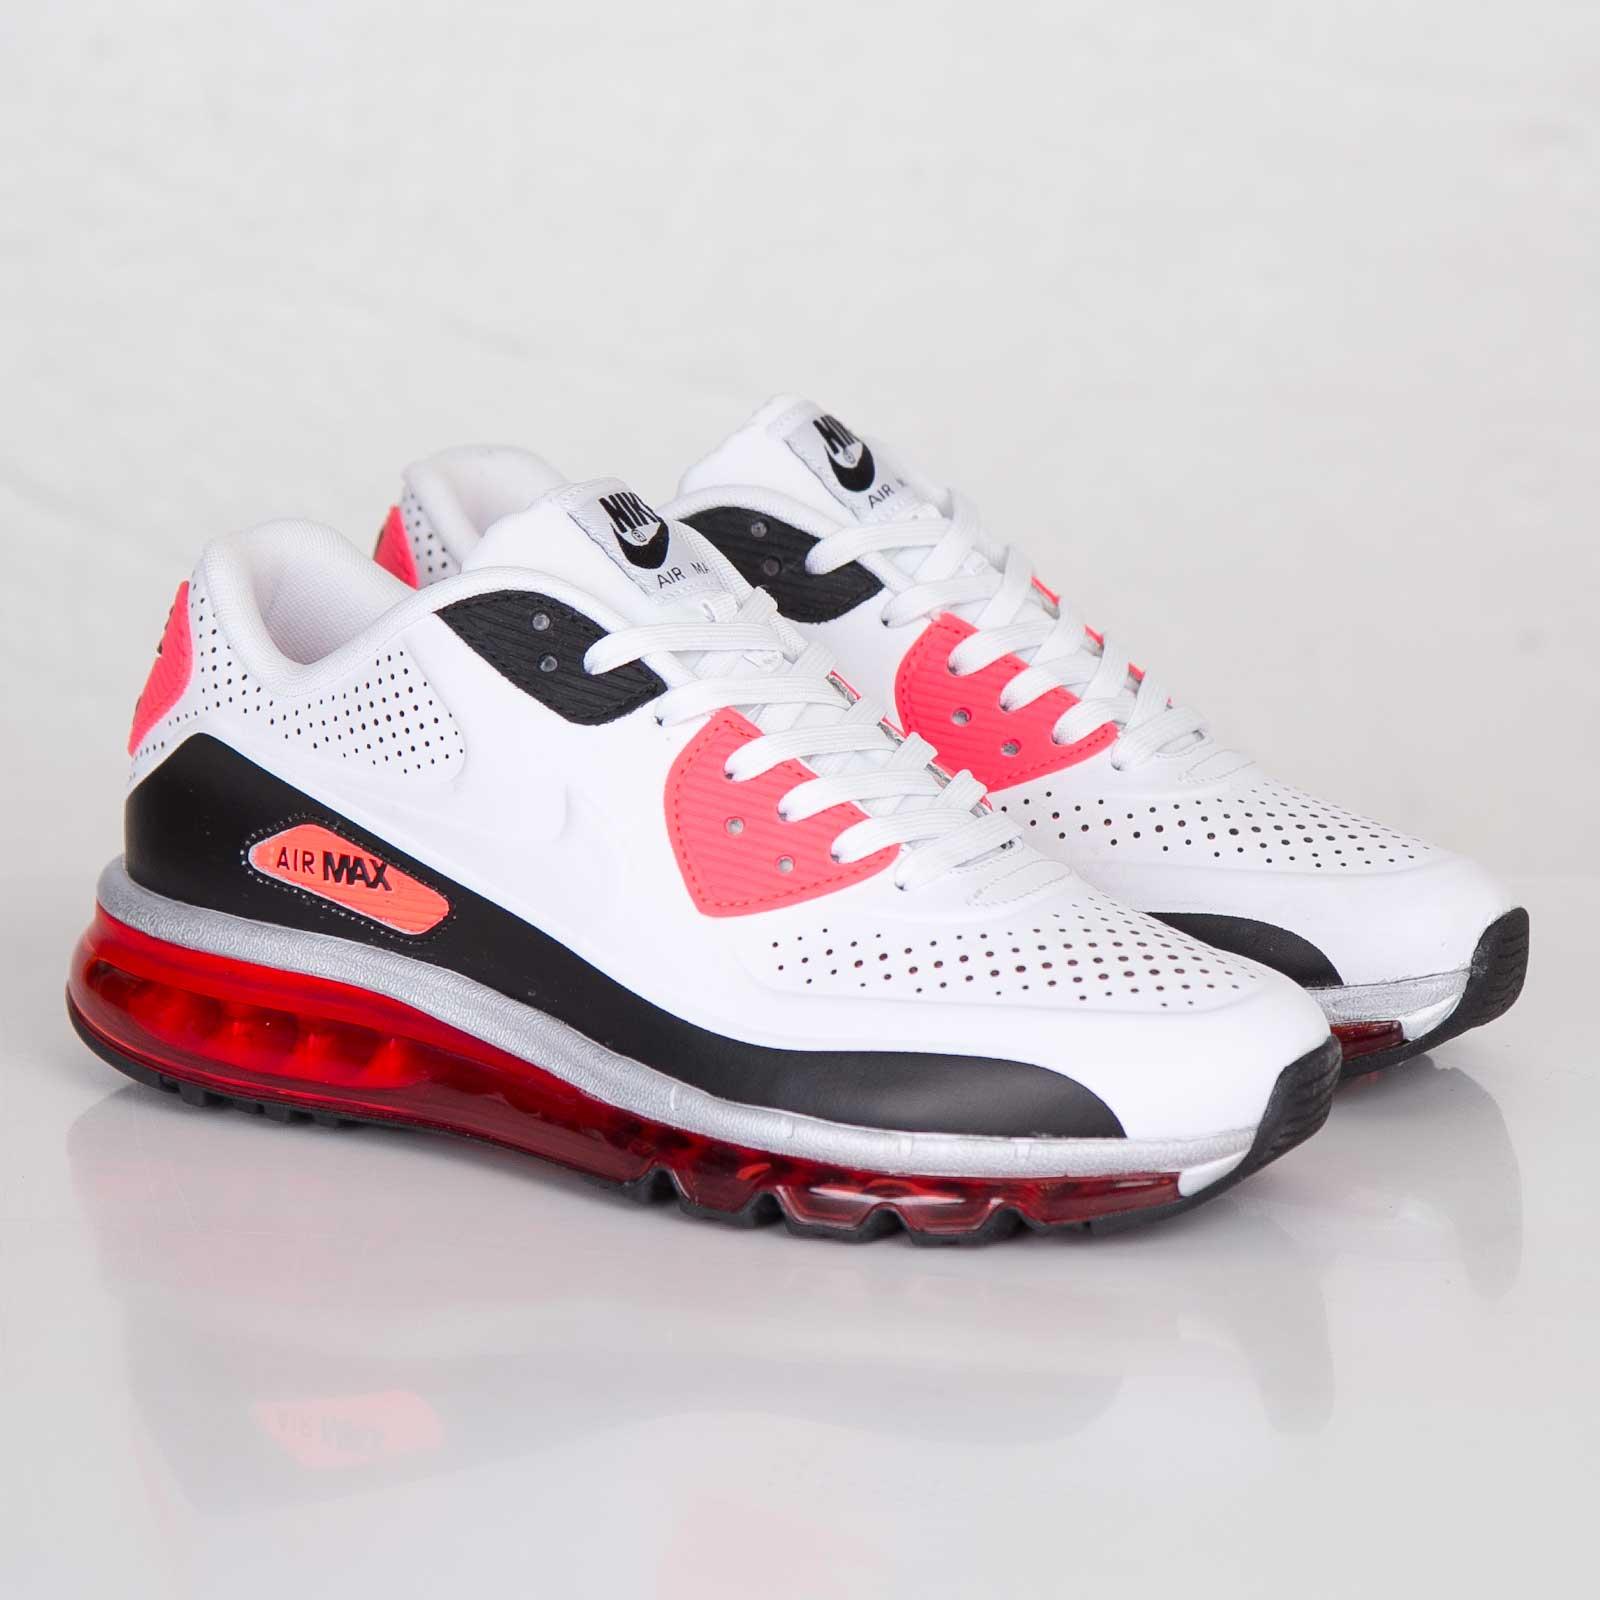 info for 82f88 b9275 Nike Air Max 90-2014 LTR QS